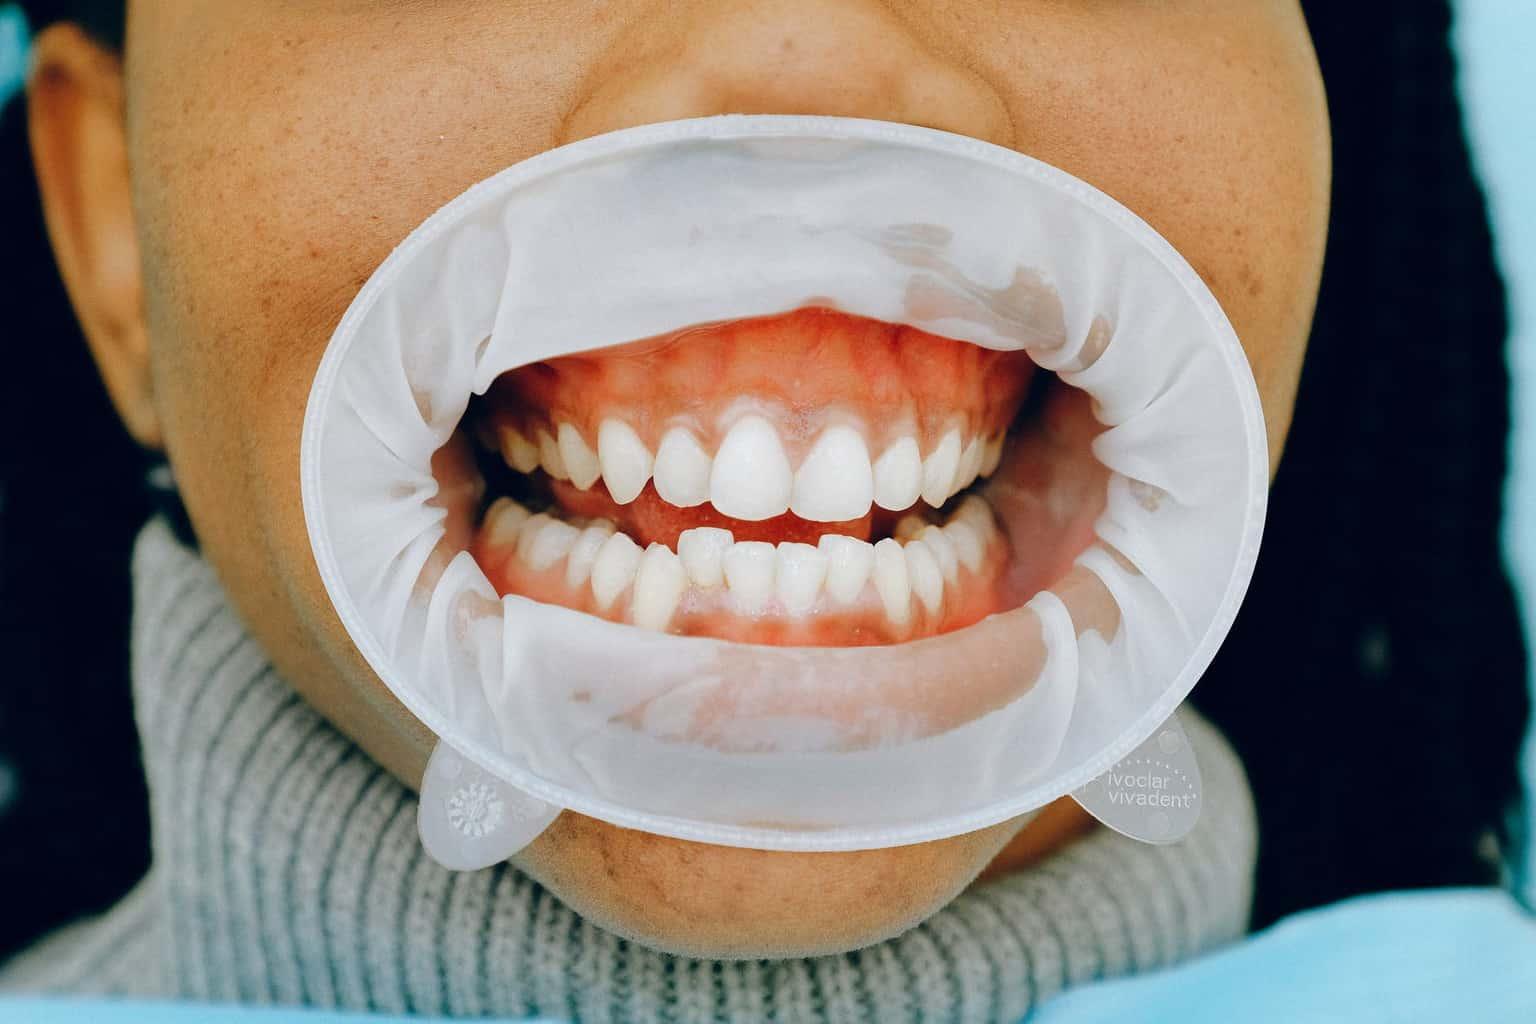 Regular dental cleaning